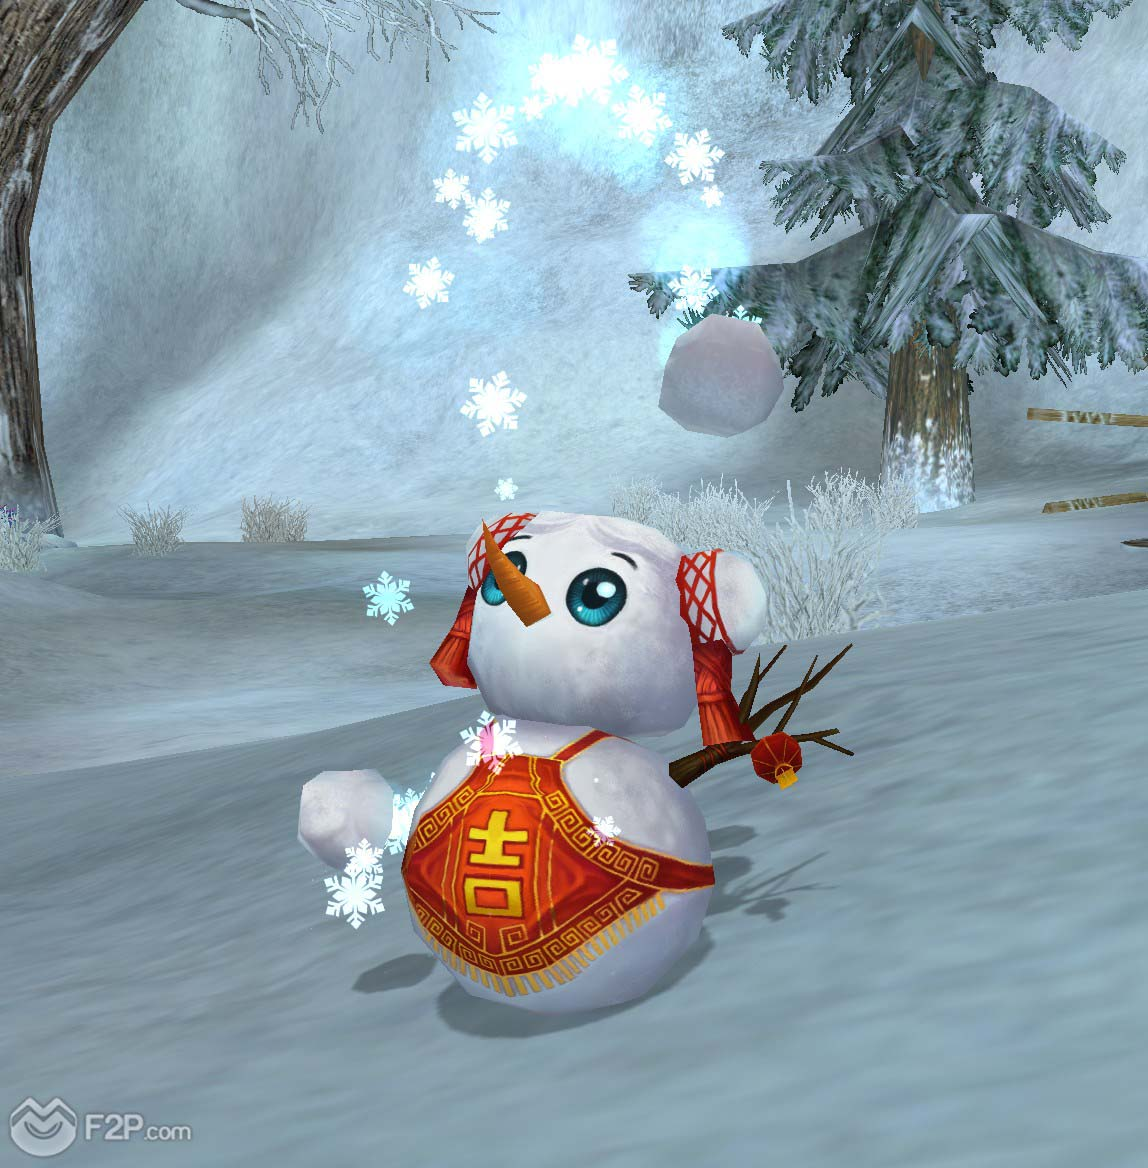 Click image for larger version.Name:christmas_snowman copia_1.jpgViews:195Size:177.0 KBID:3419